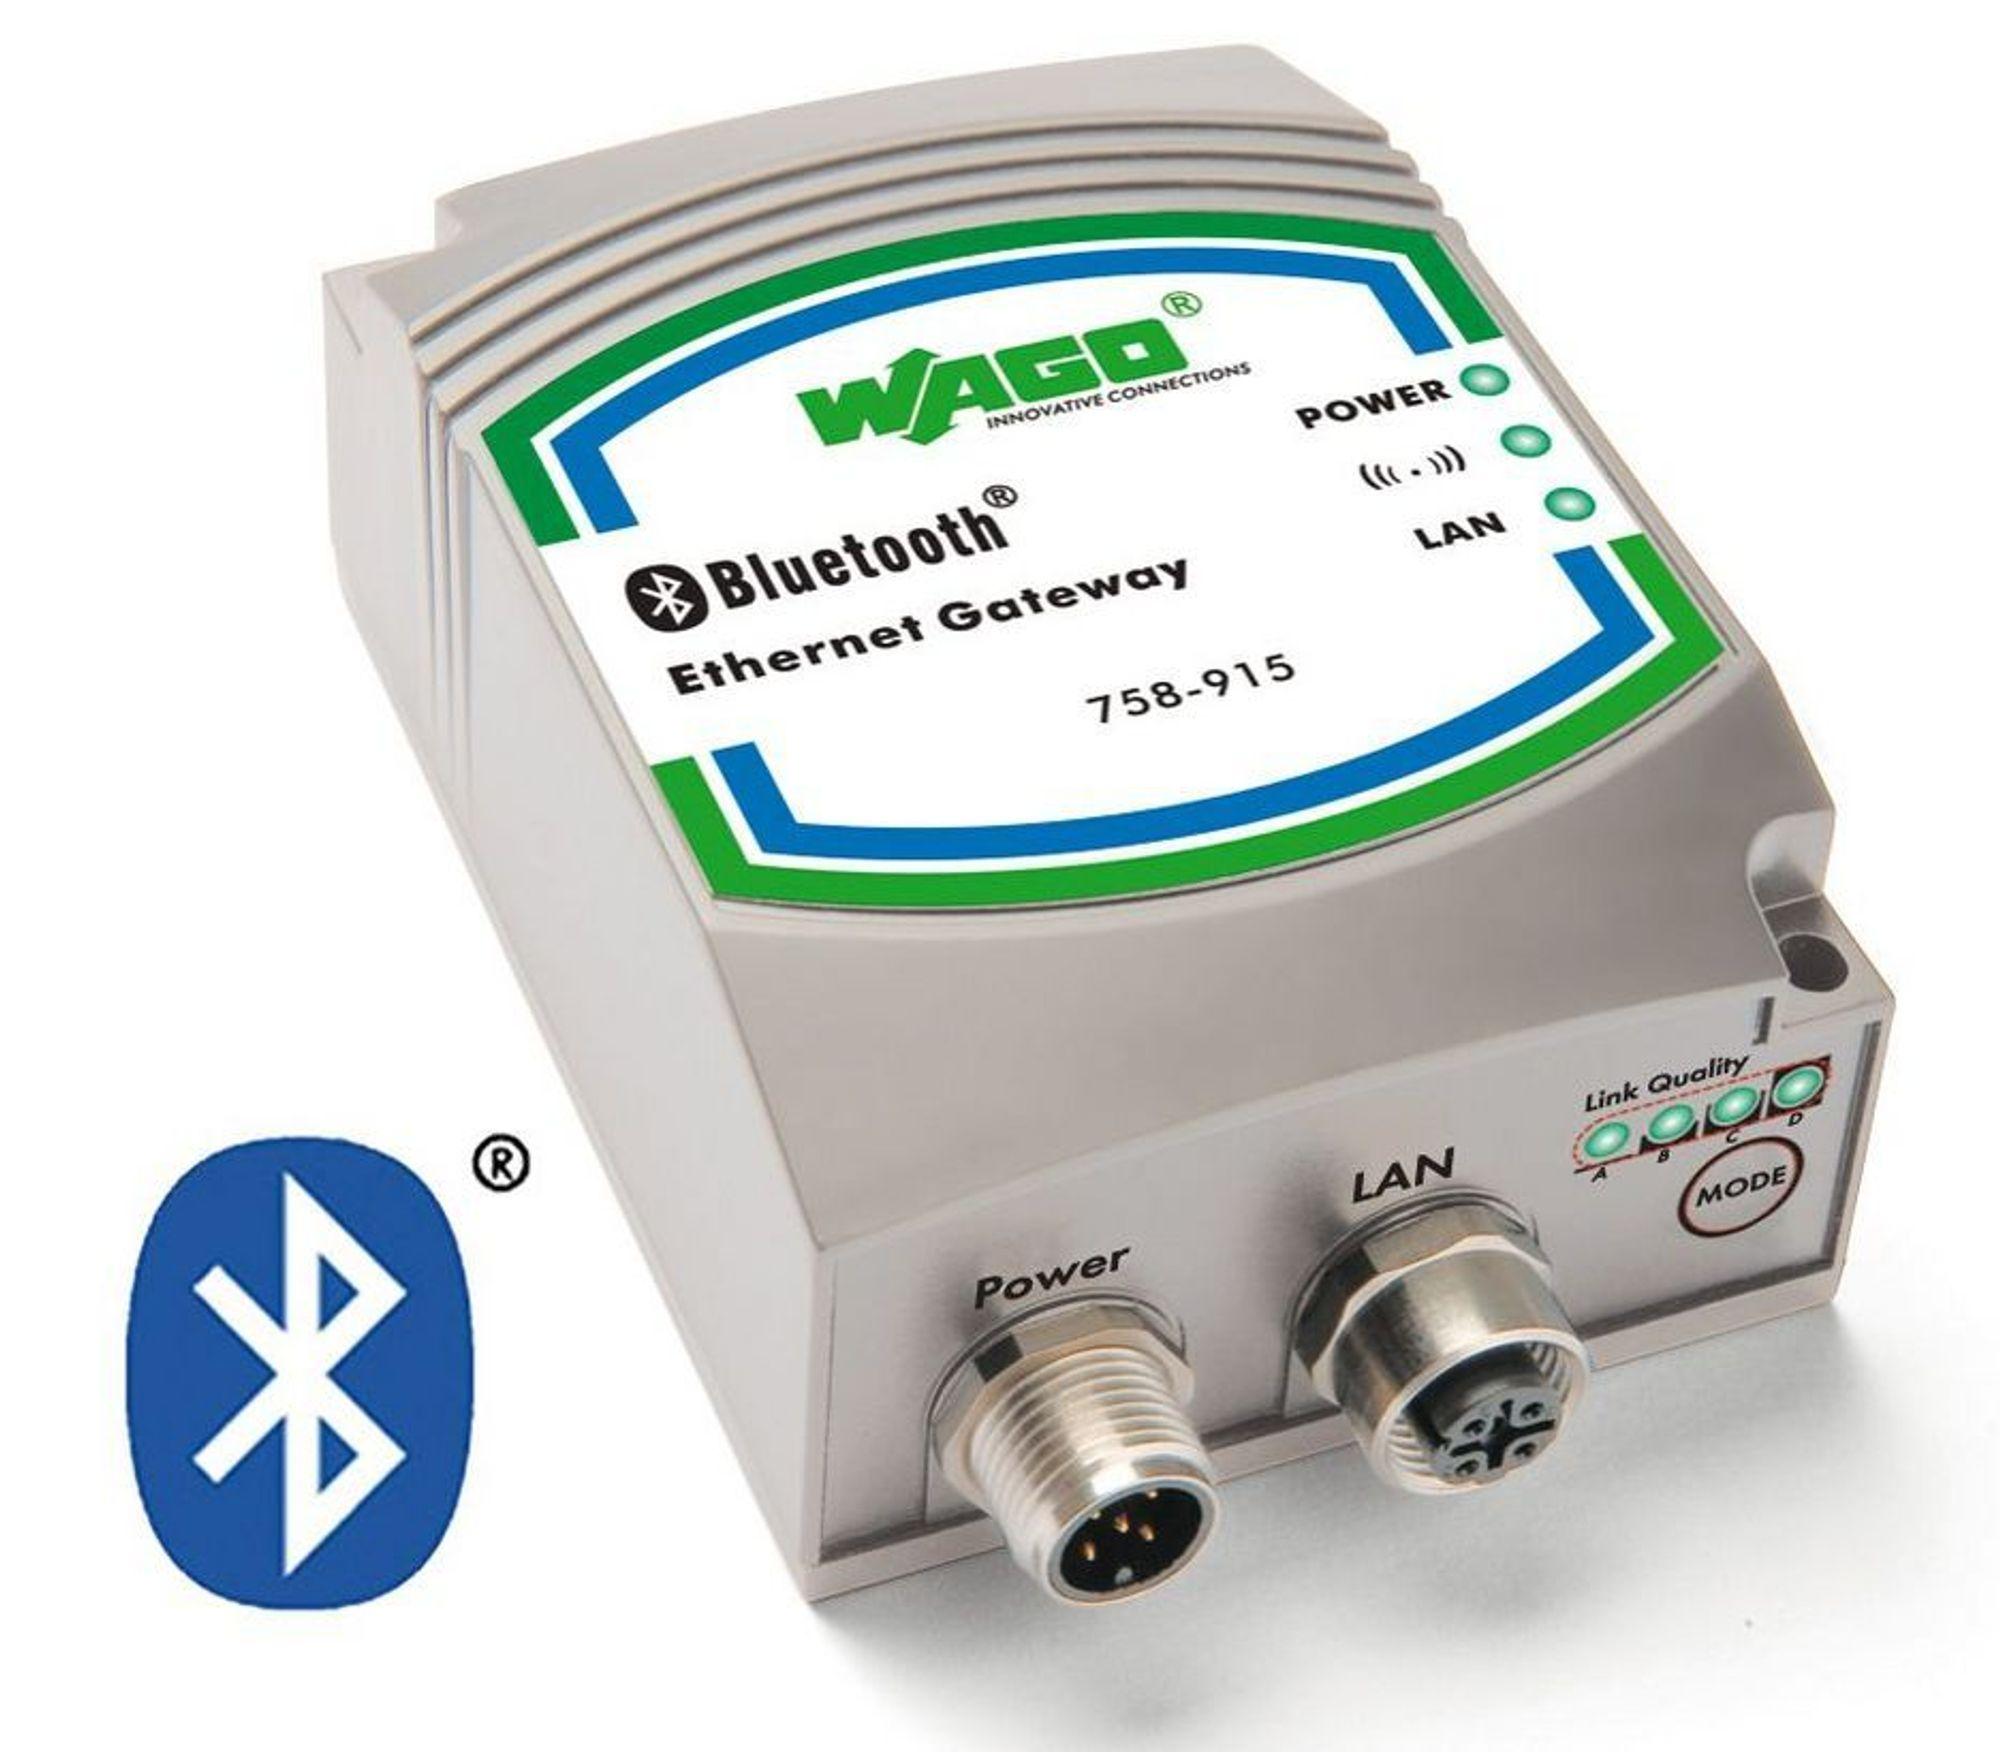 Trådløst Ethernet via Bluetooth